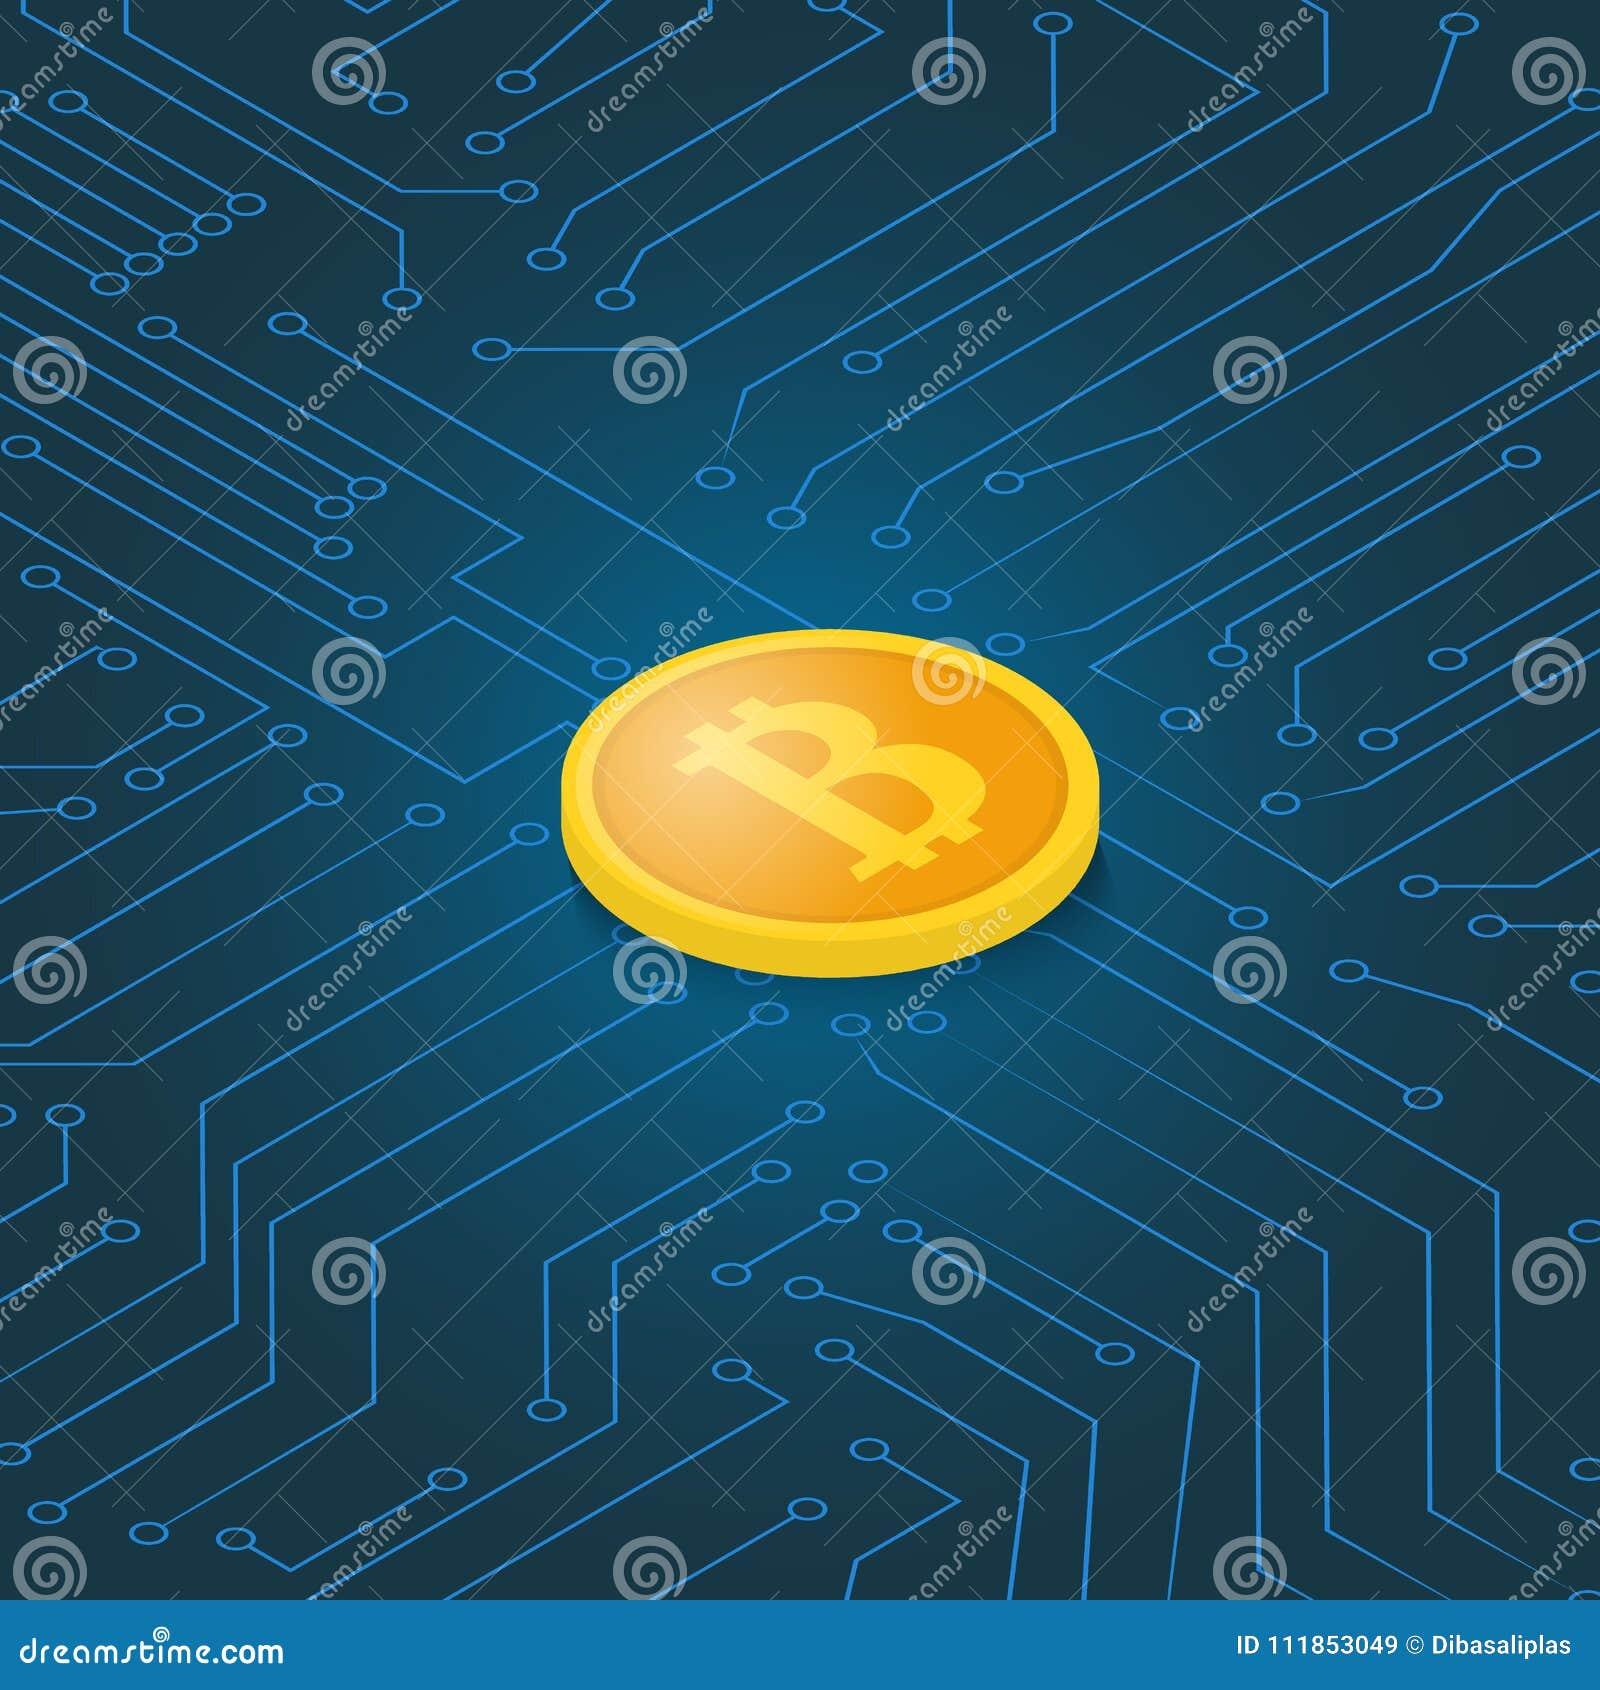 Coin bitcoin on a computer chip.